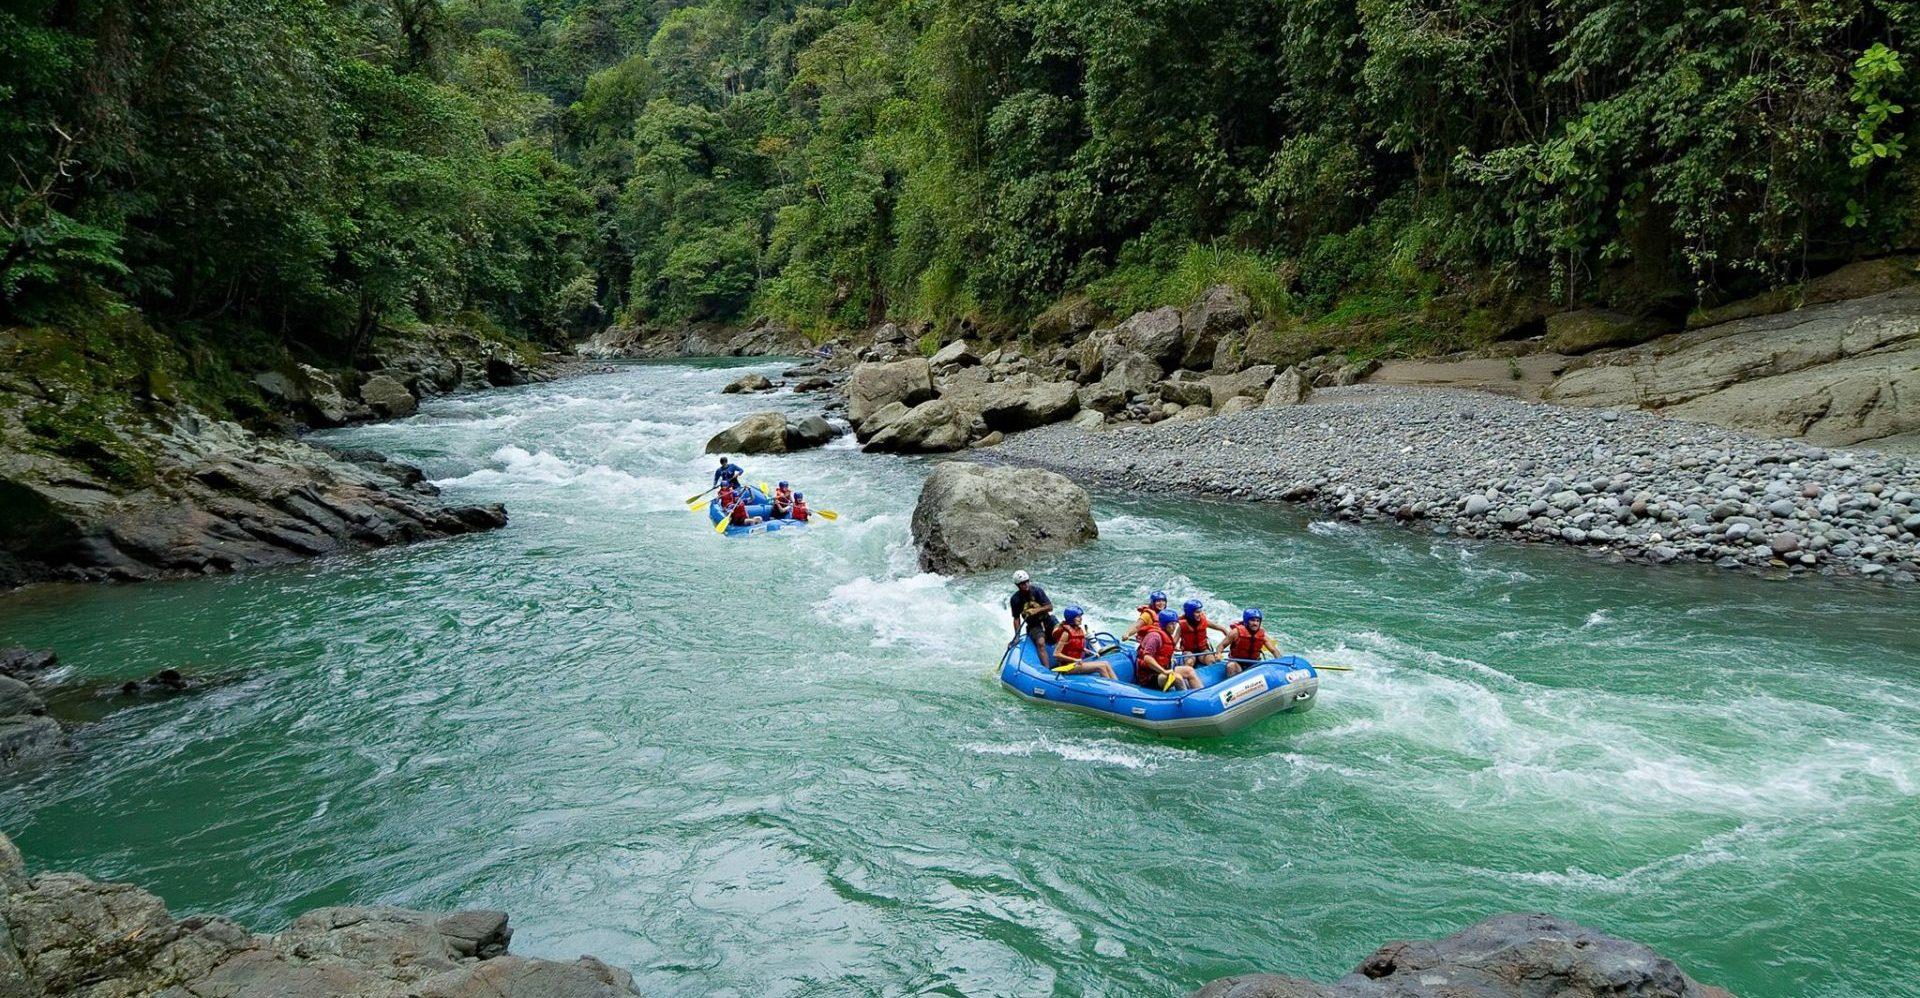 Costa Rica, Lapa Rios, Aussicht aufs Meer, Sonnenuntergang, Latin America Tours, Reisen